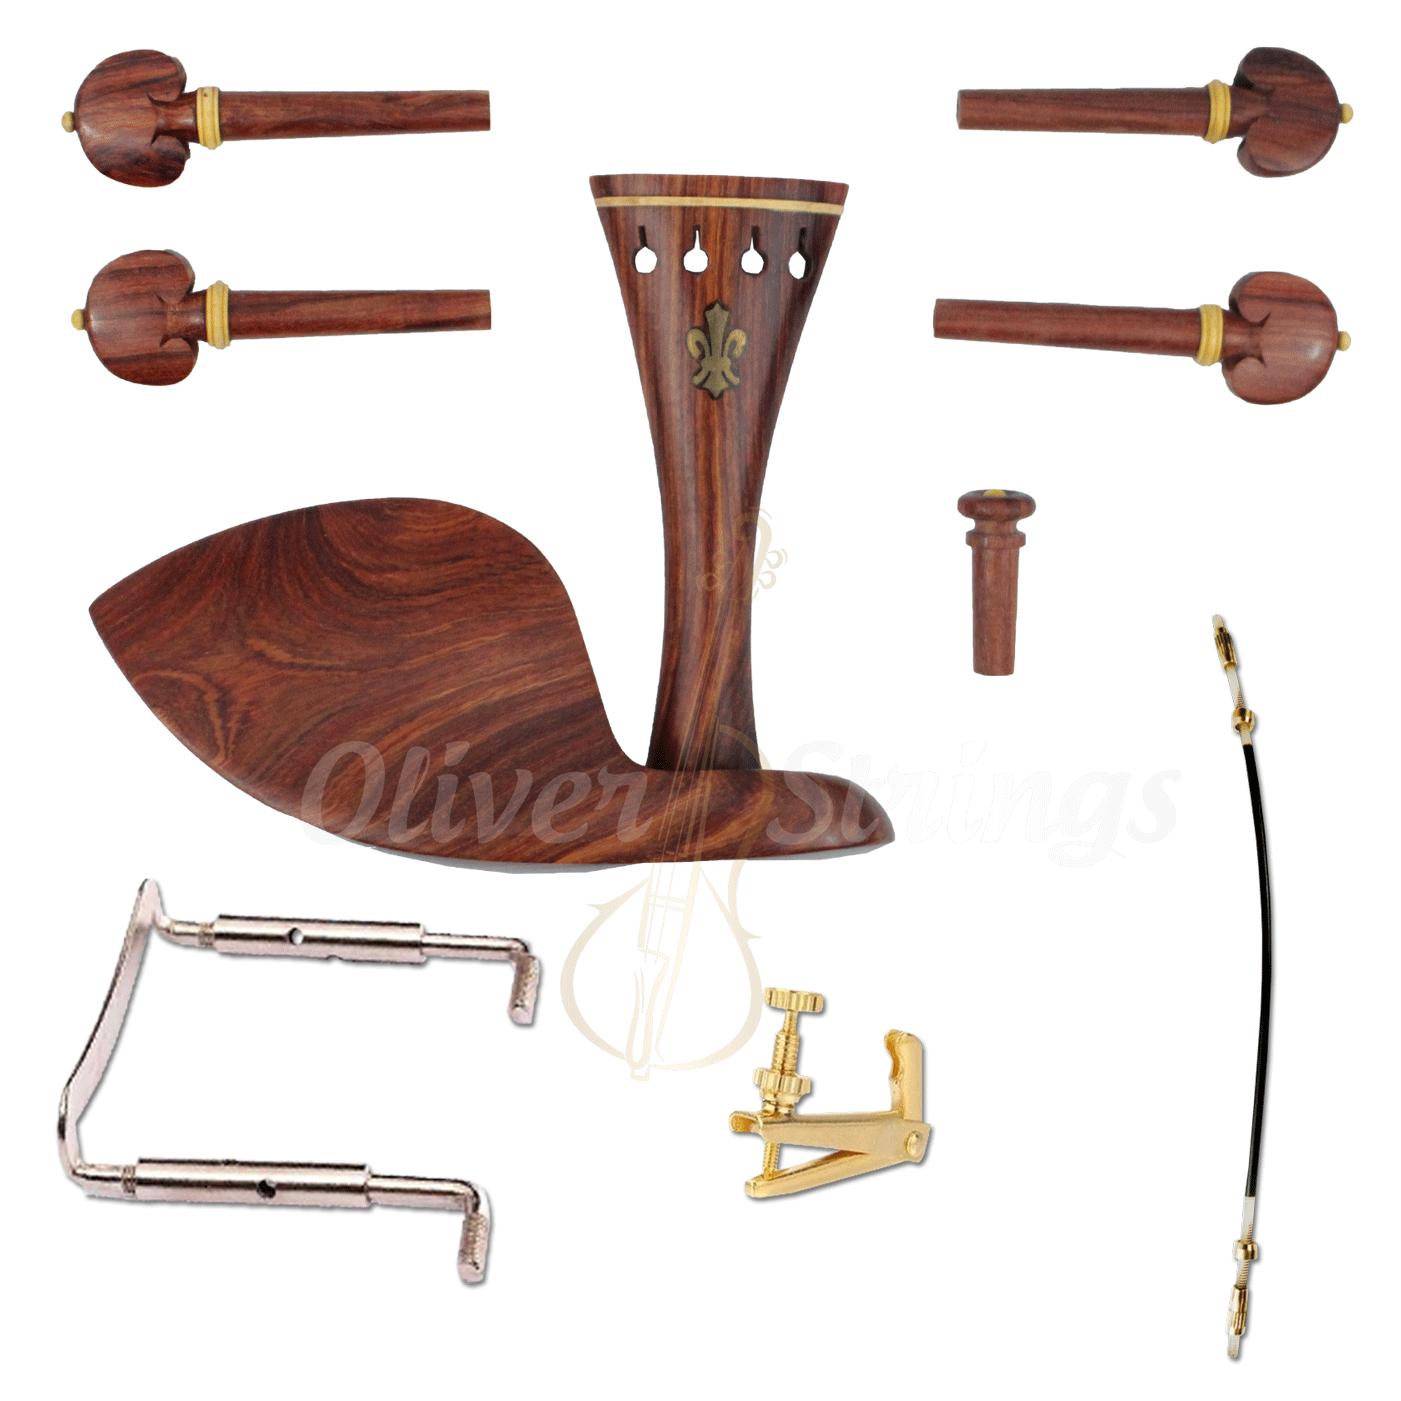 Kit De Montagem Para Violino 4/4 Rosewood Completo Flor de Lis